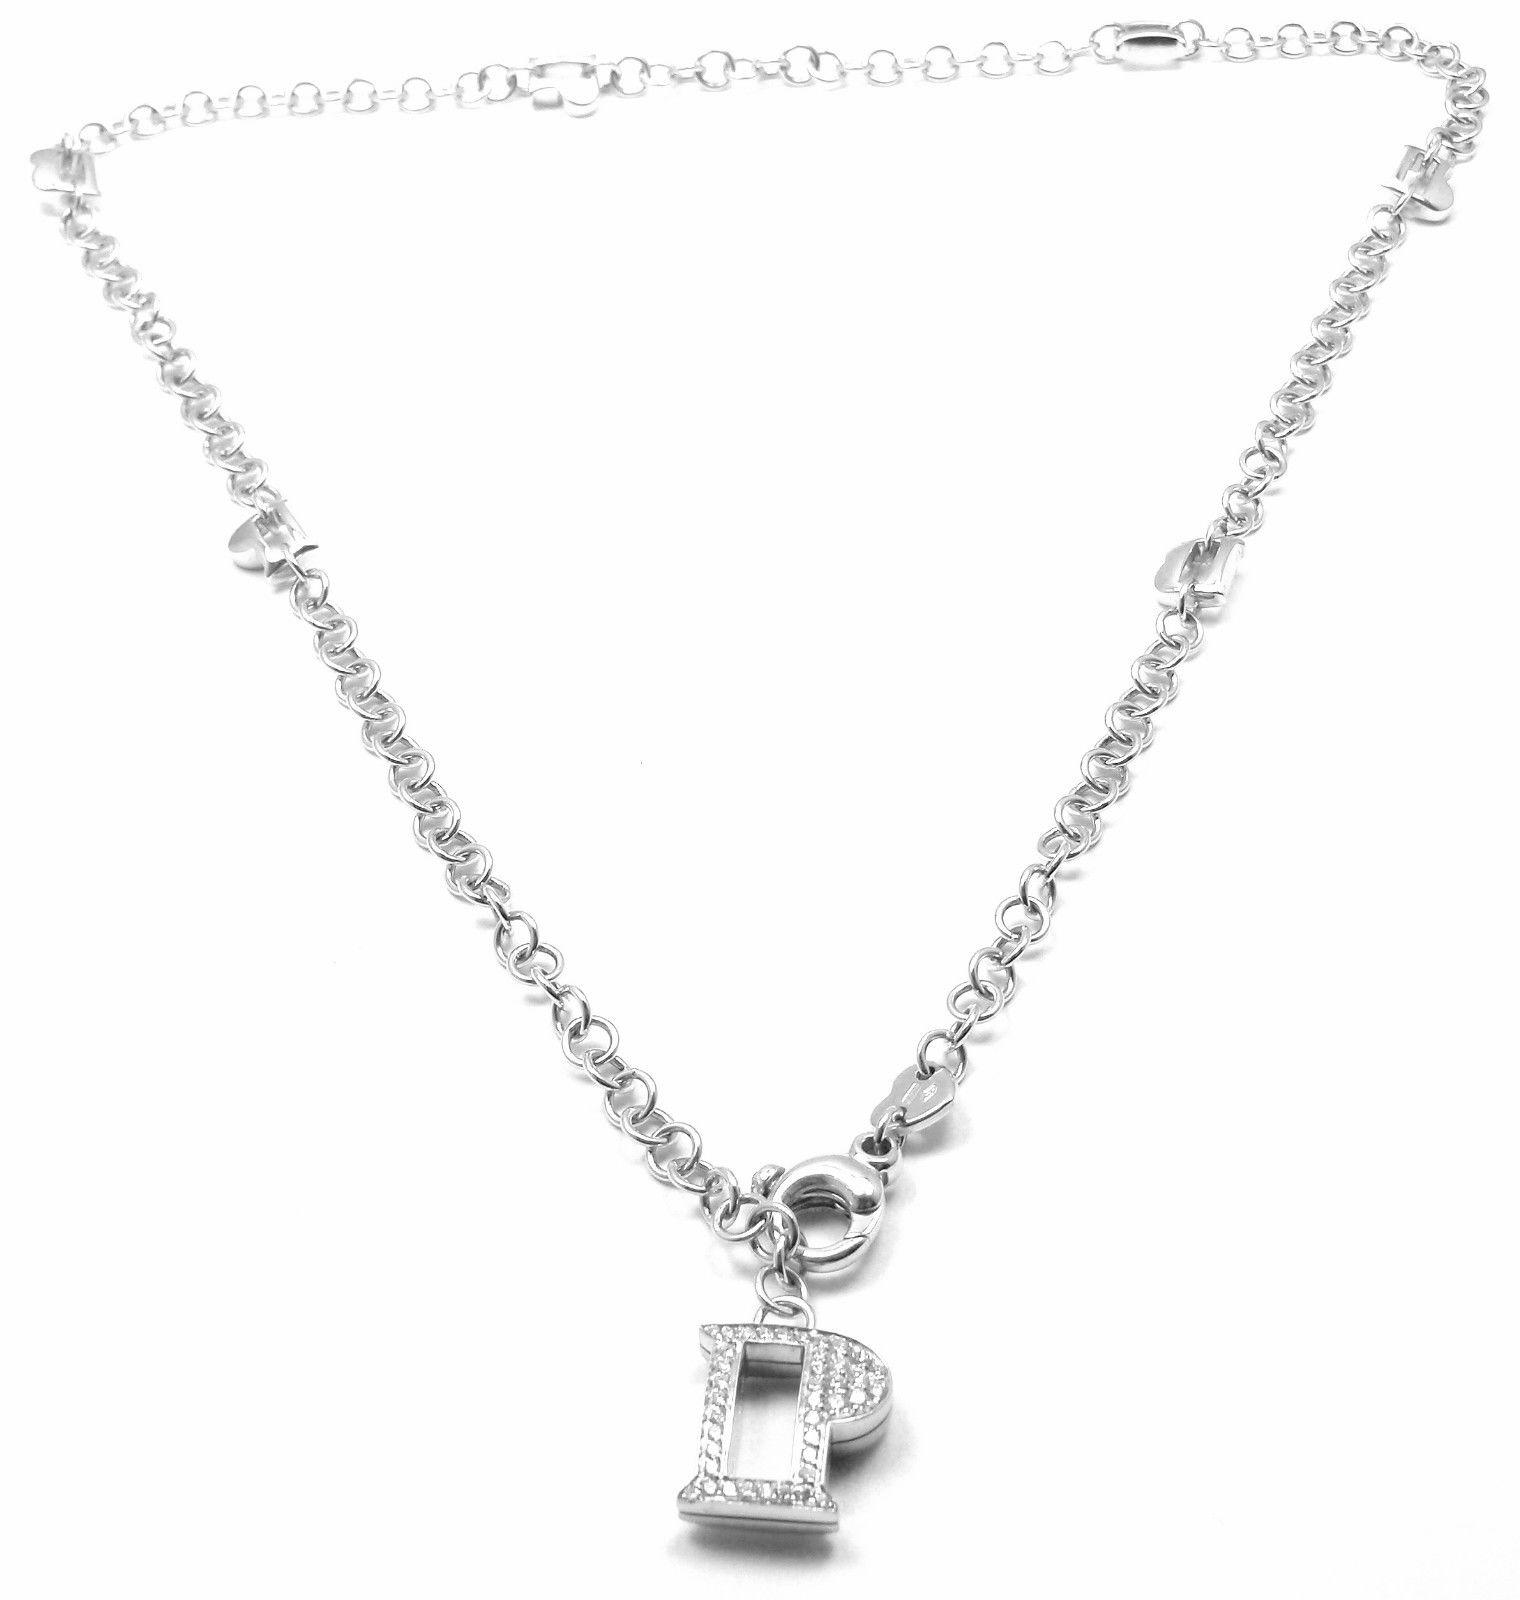 """""Pasquale Bruni 18K White Gold Diamond P necklace"""""" 666135"